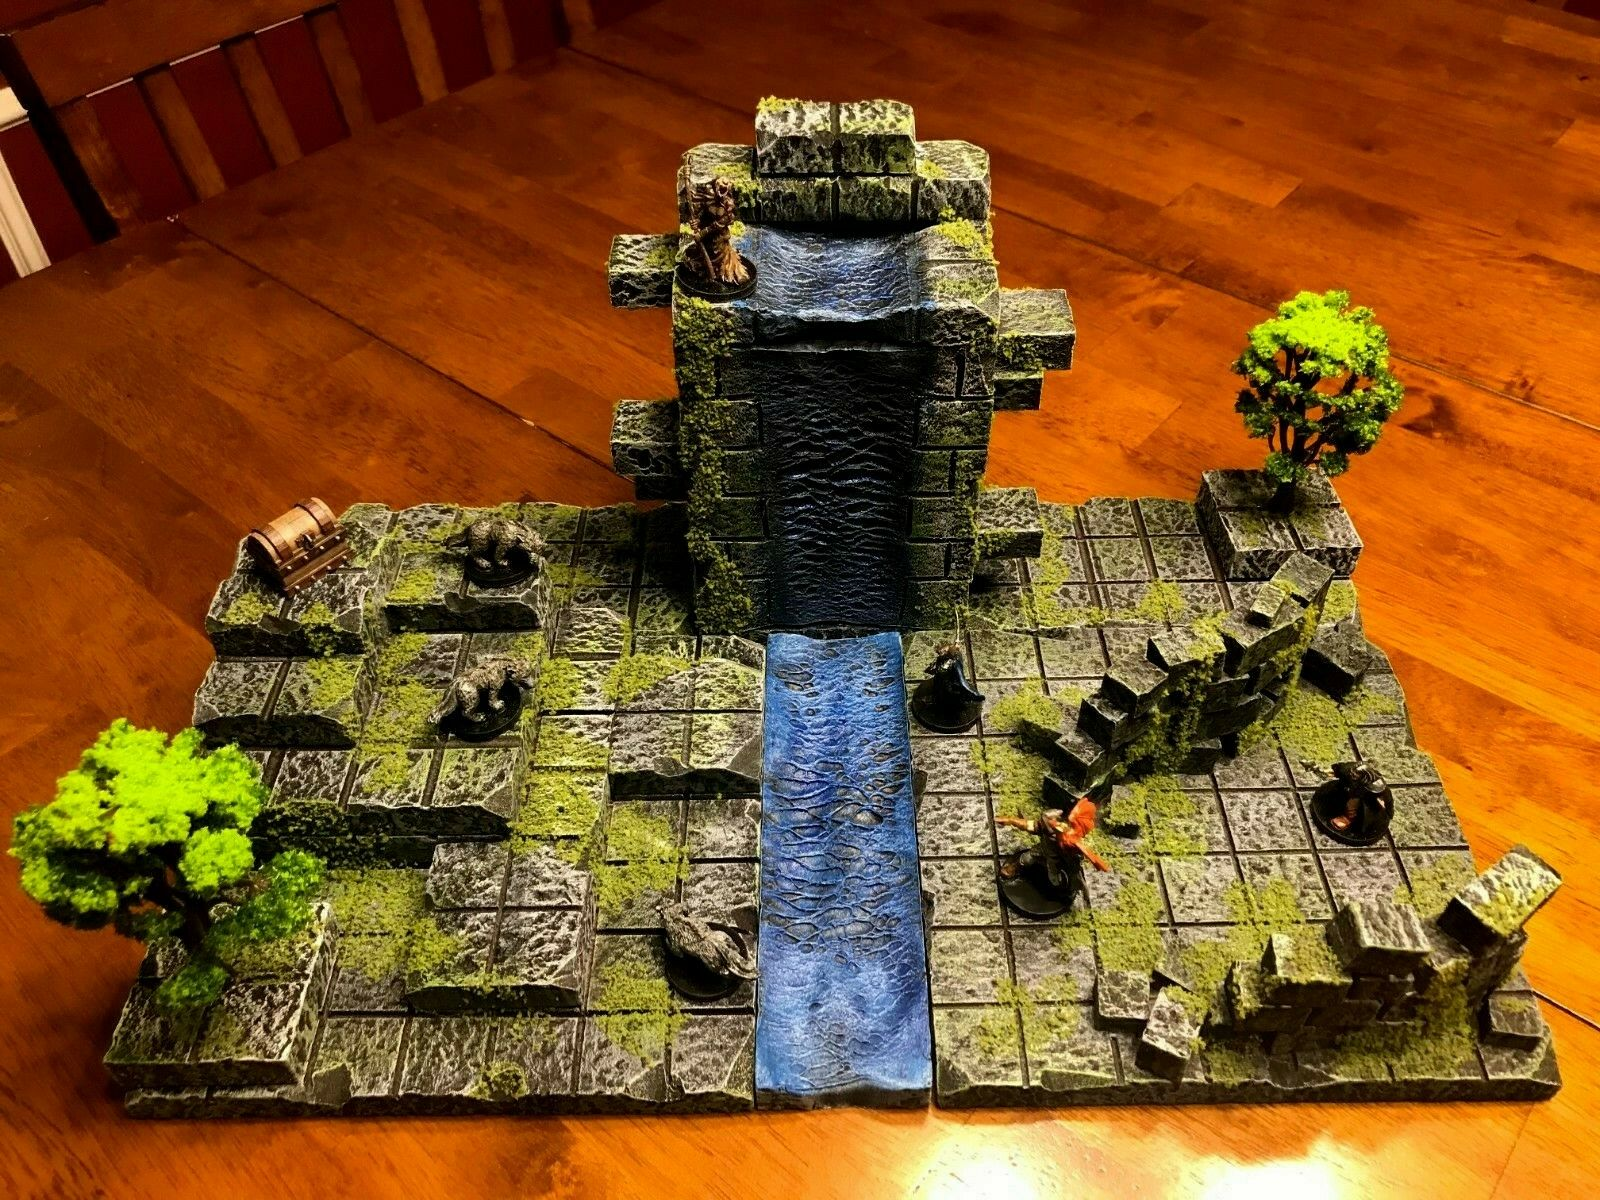 La Sagrada aguas de desgracias 28mm terreno Dungeons & Dragons Pathfinder D&D Paisaje